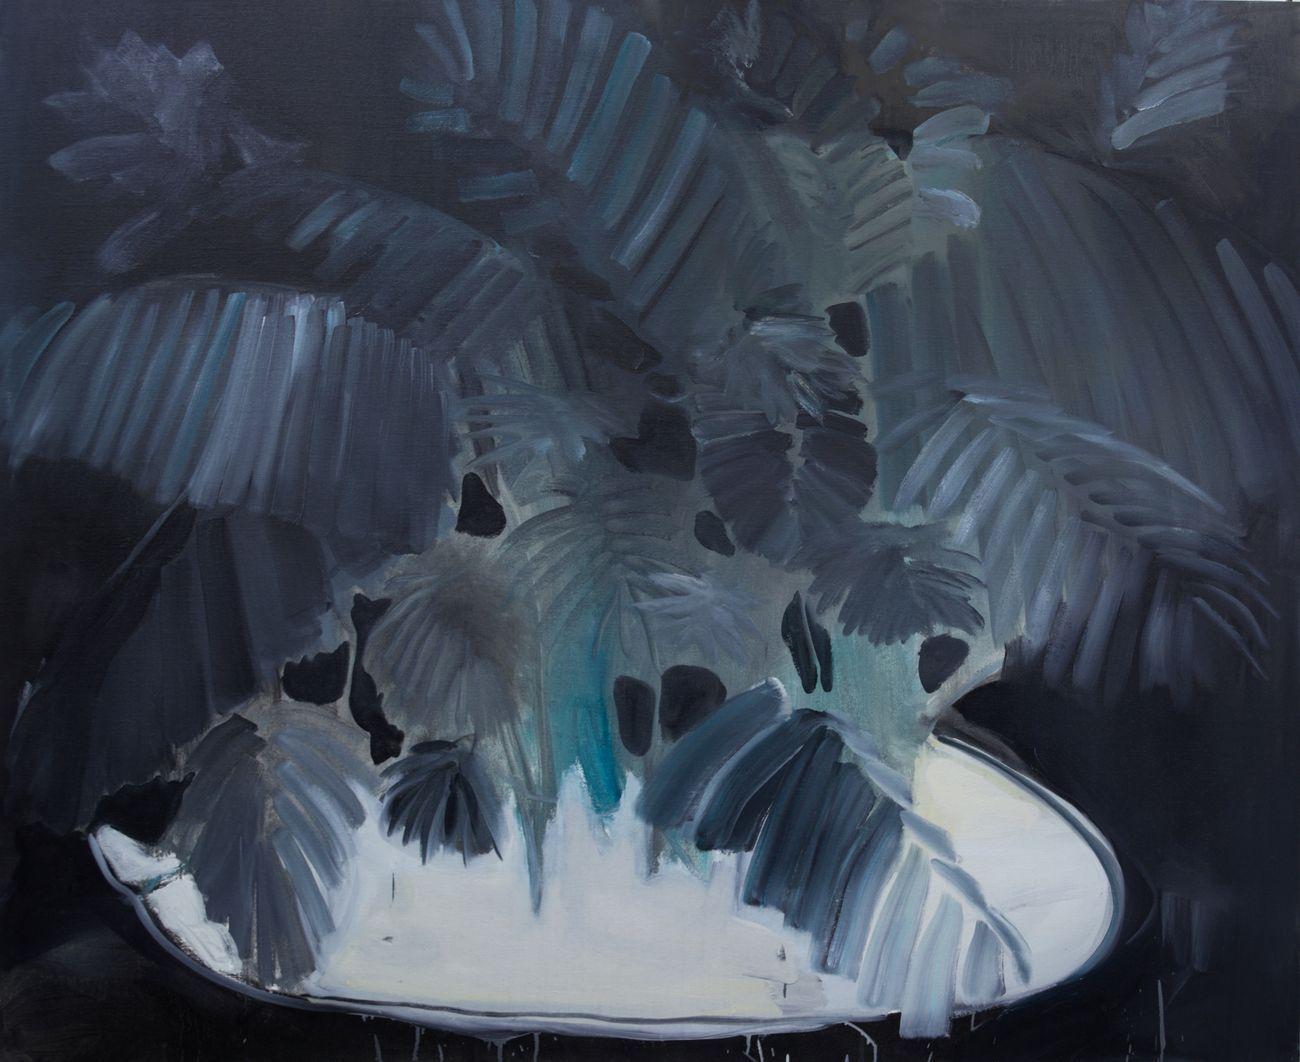 Rudy Cremonini, Kenzia con base bianca (notturna), 2018, oil on juta, 160x200 cm